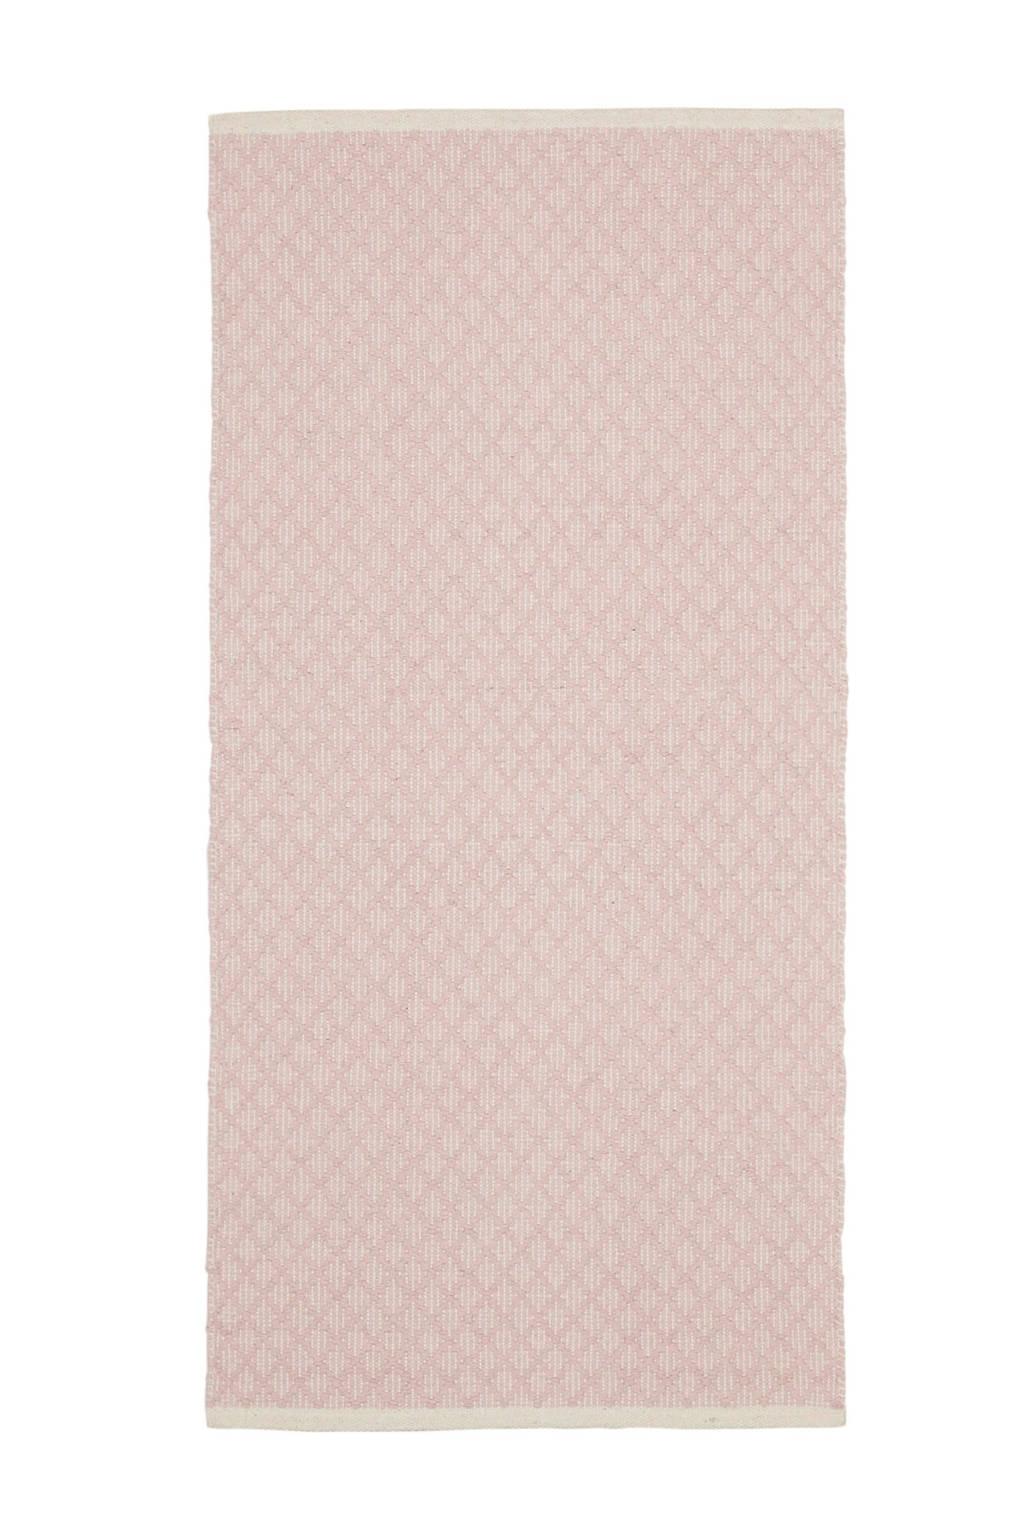 Kidsdepot vloerkleed  (140x70 cm), Roze/ecru